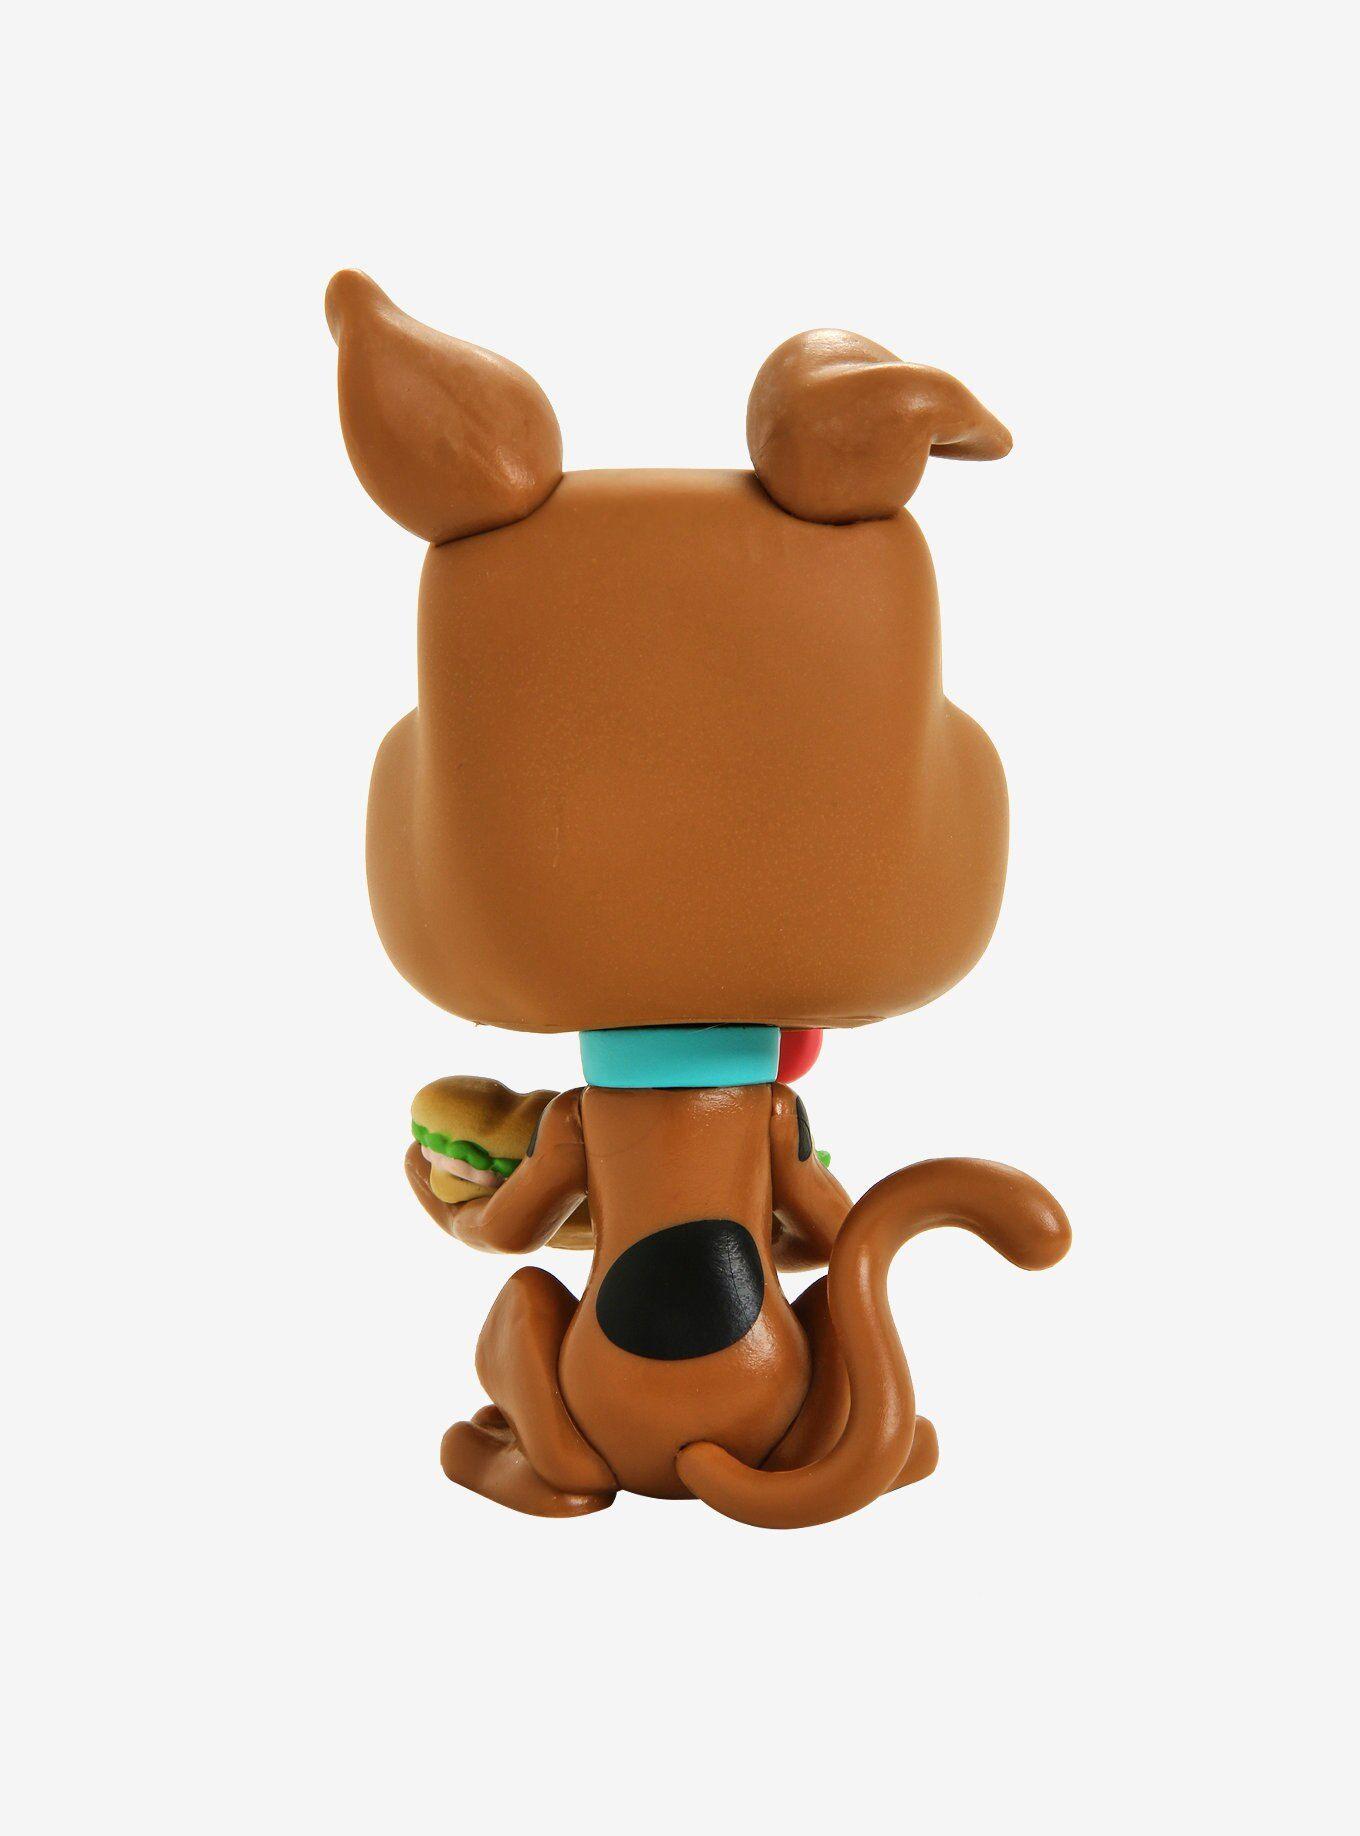 Scooby-Doo #625 - Funko Pop! Animation